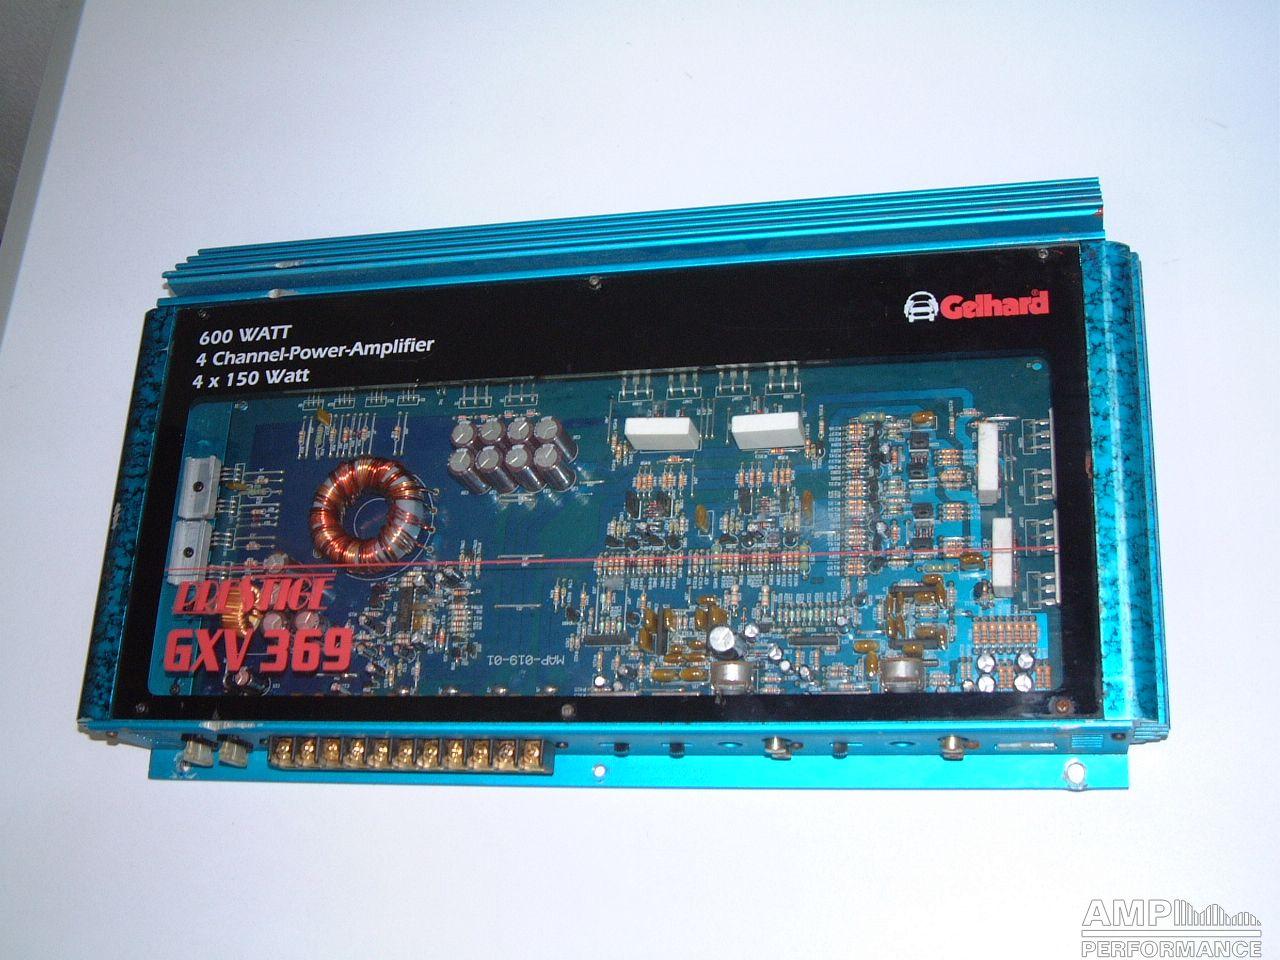 Gelhard Prestige GXV 369 - AMP Performance